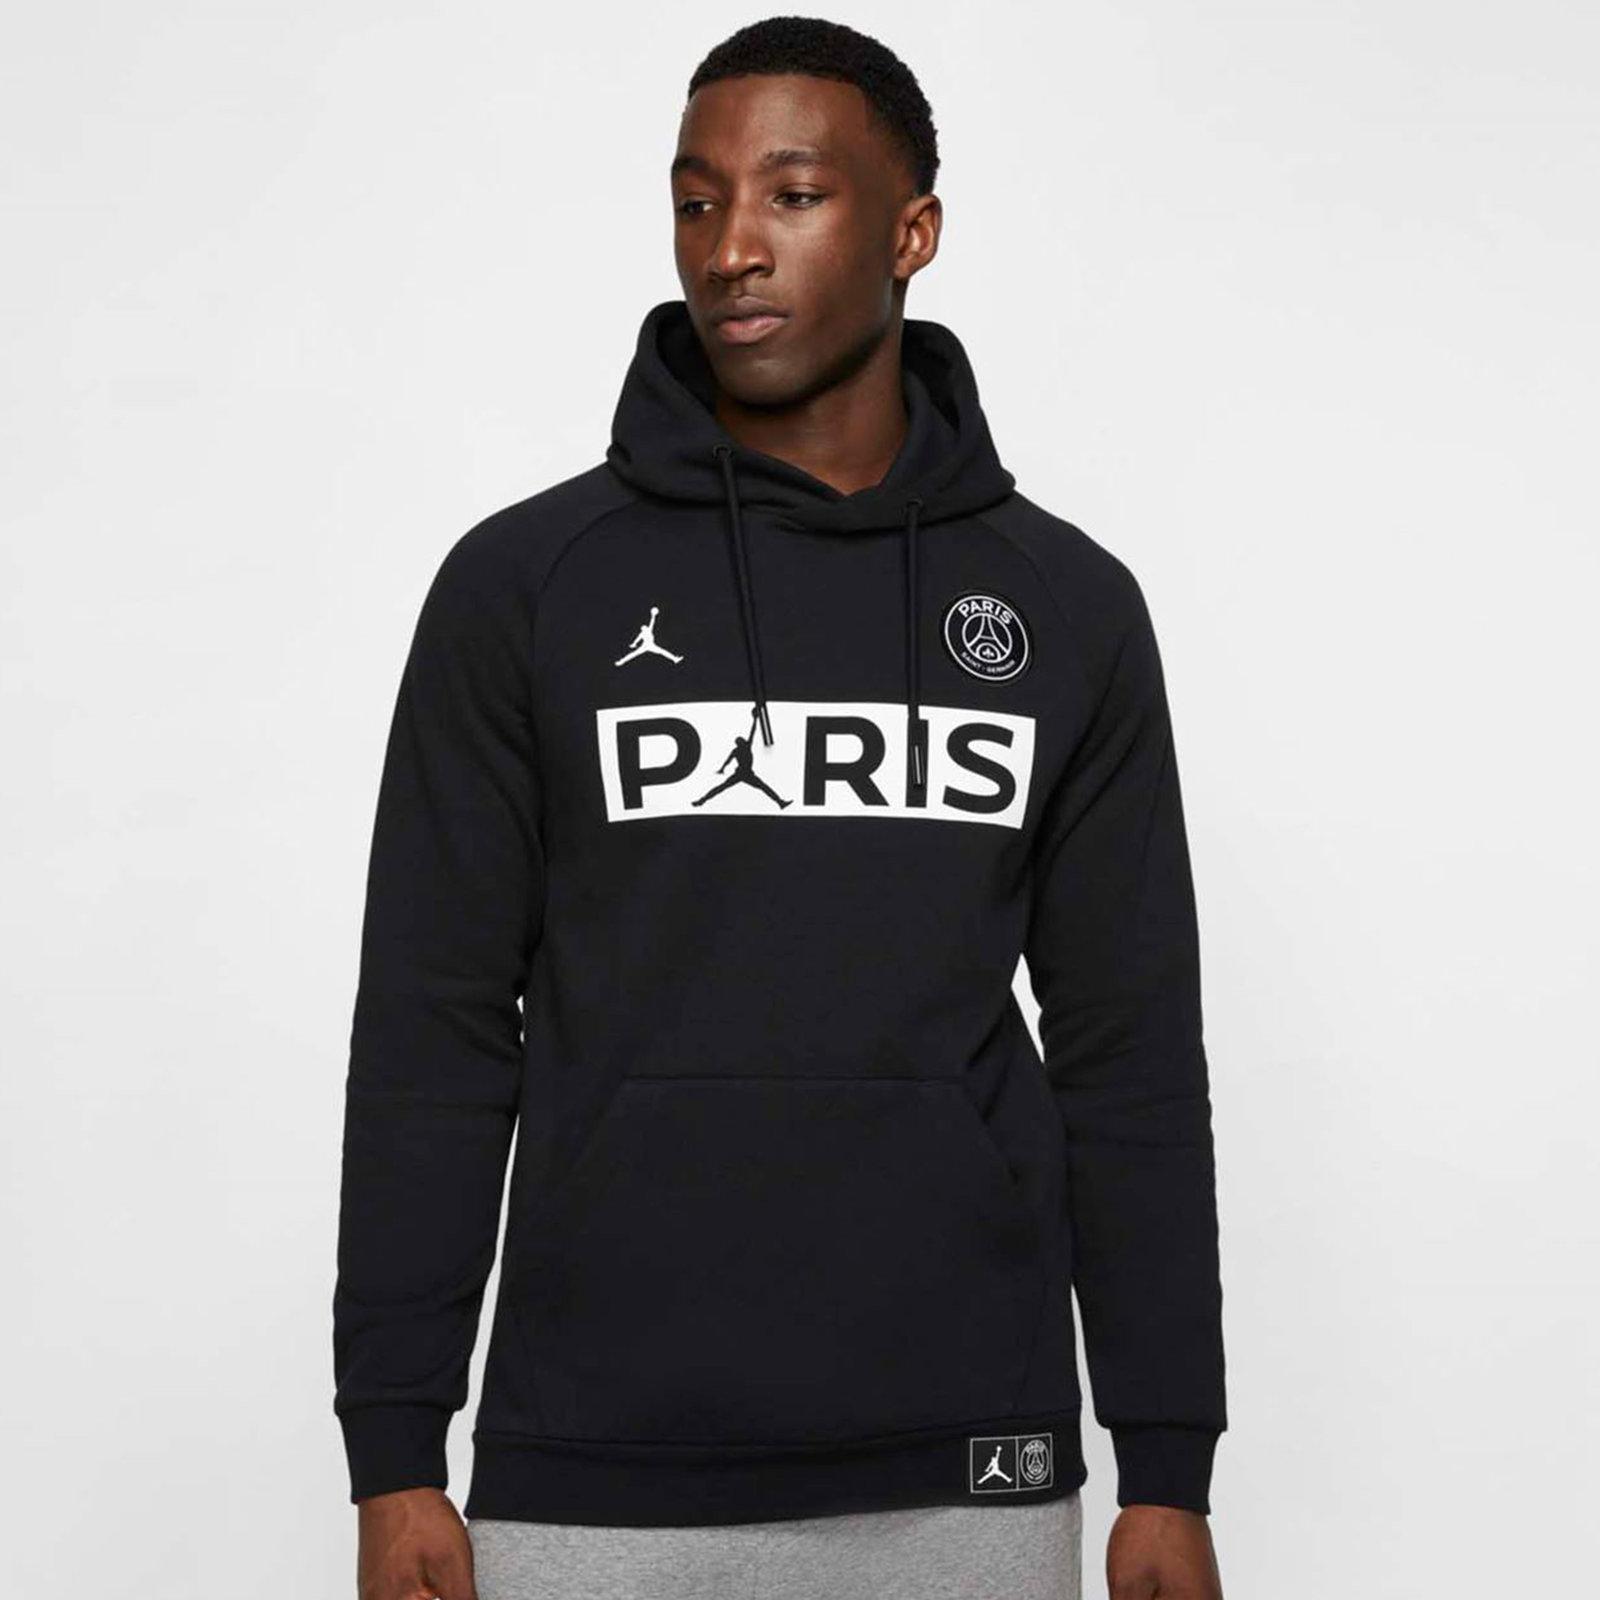 corona rasguño combate  Nike Paris Saint-Germain Fleece Pullover Hoodie - Black | BQ8350-010 |  FOOTY.COM